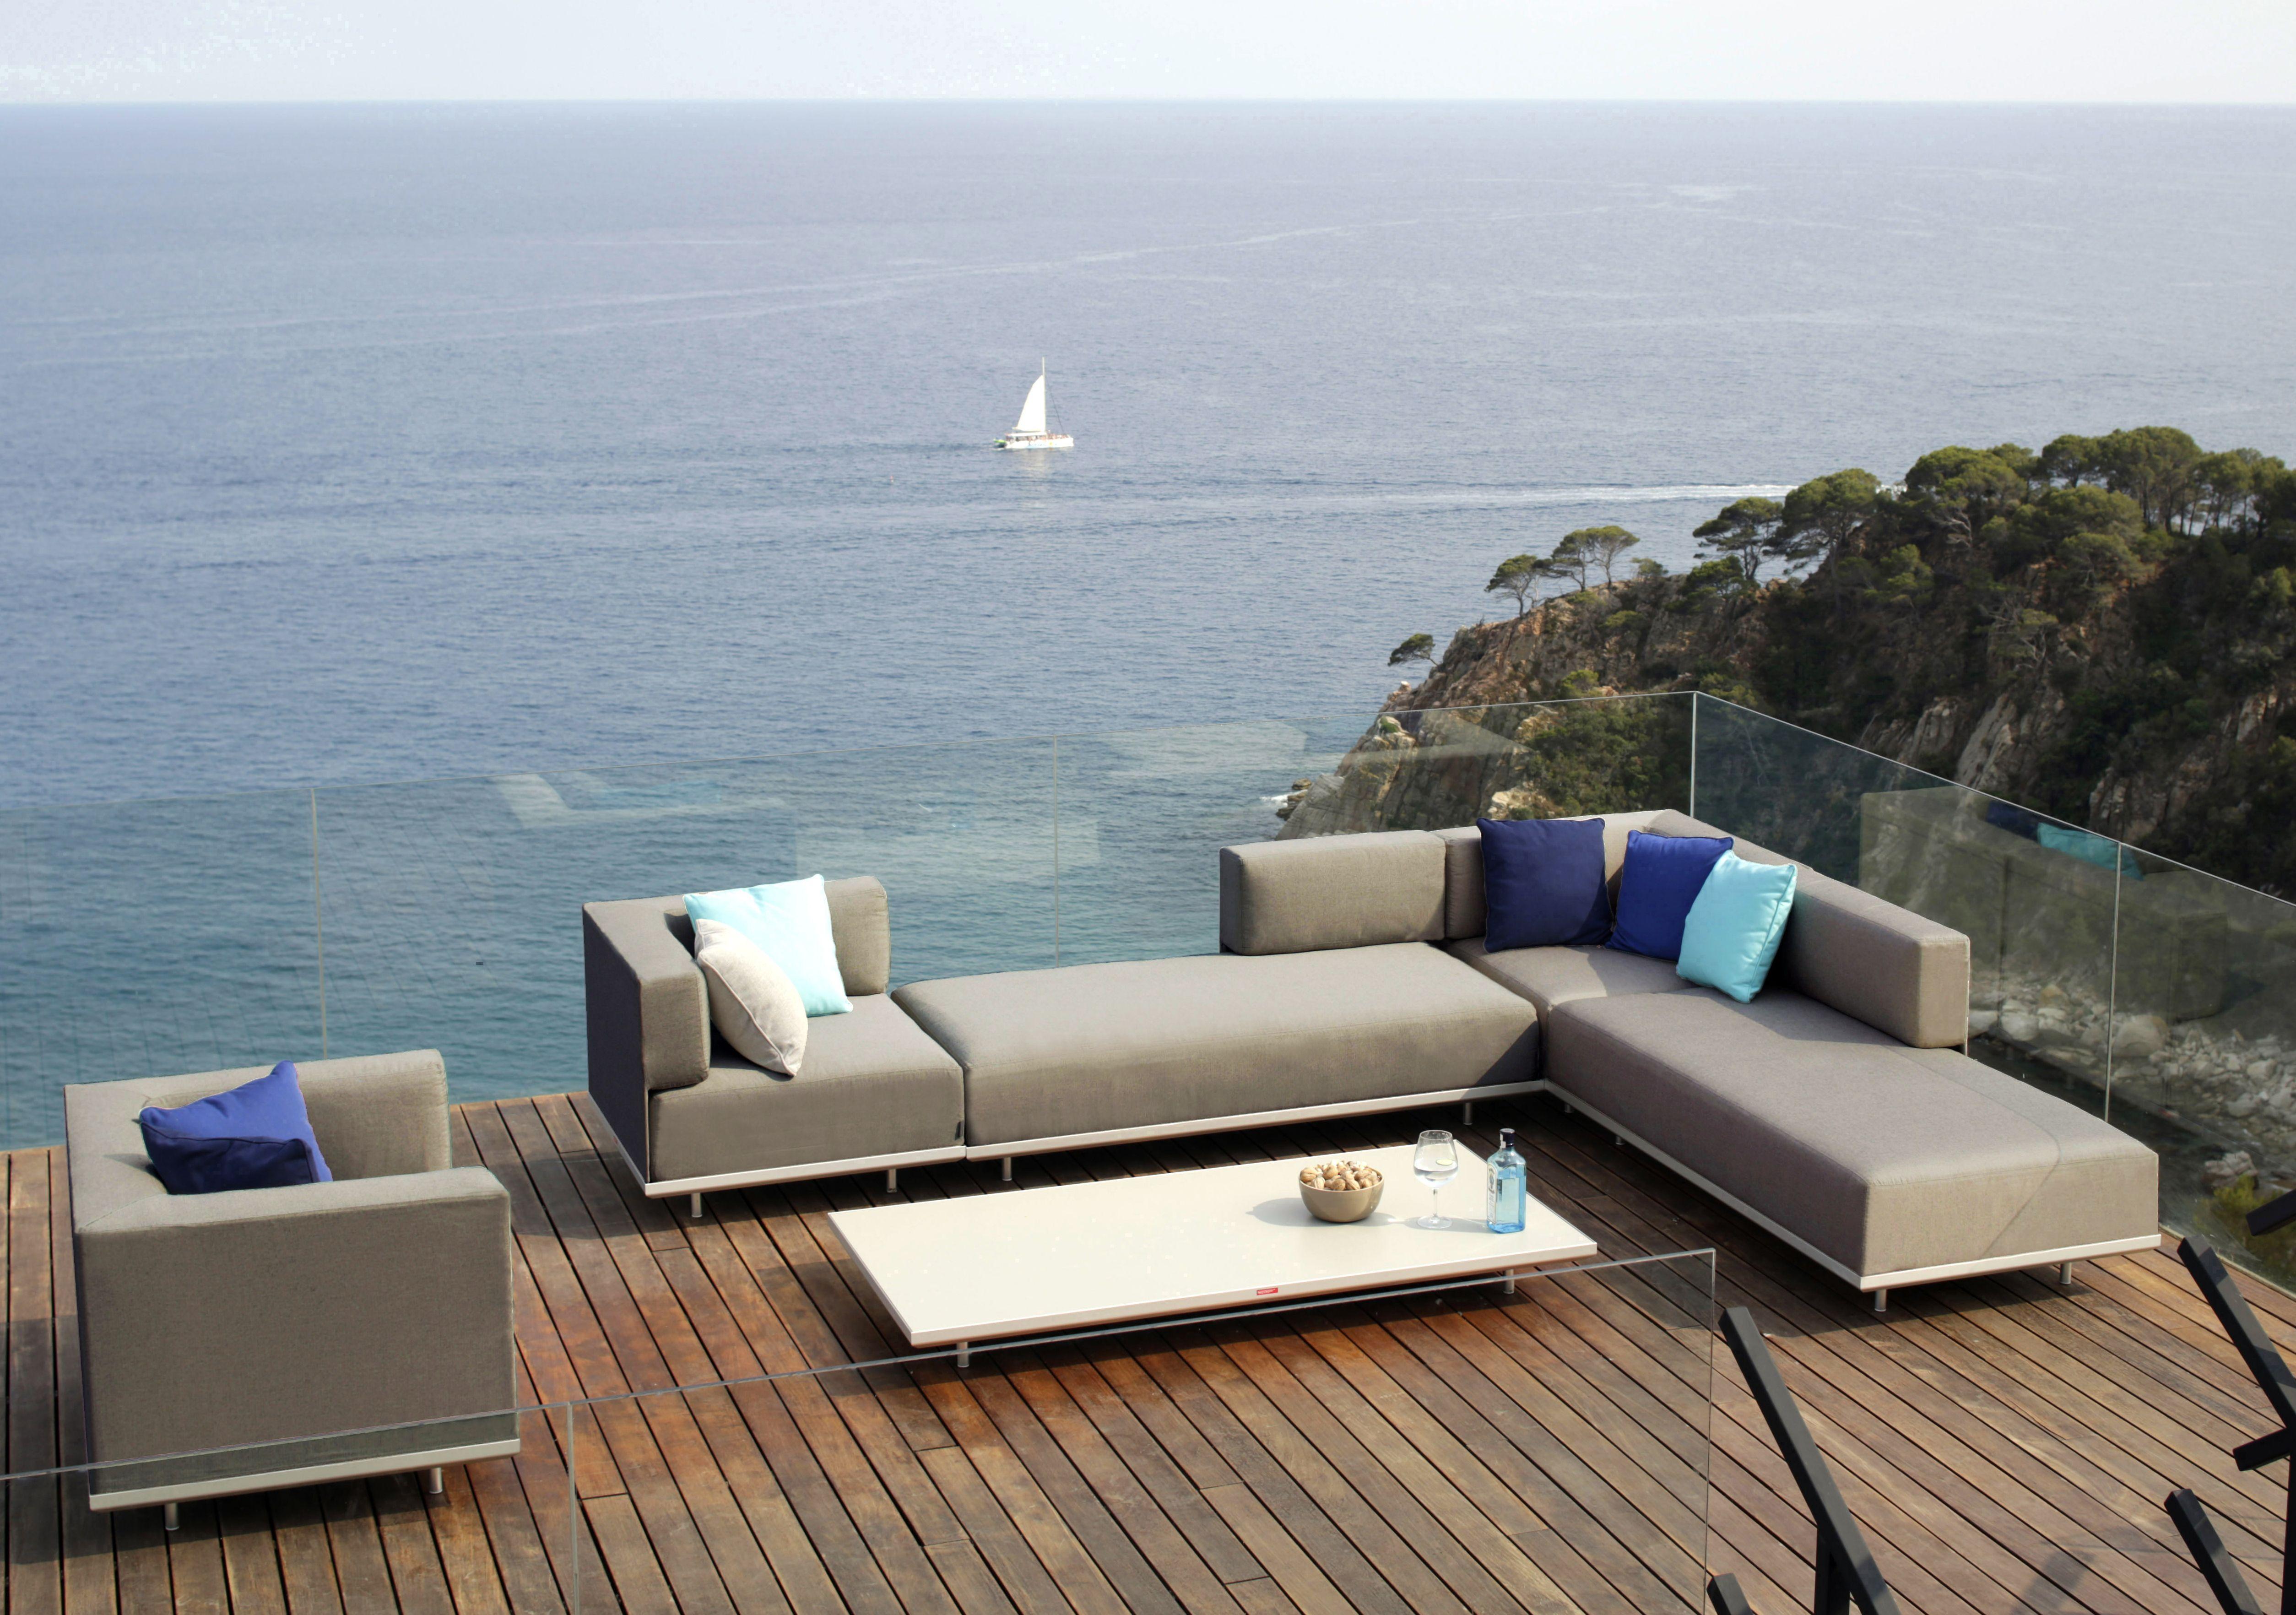 garten lounge ratgeber | terrasse | pinterest | garten lounge, Gartenmöbel